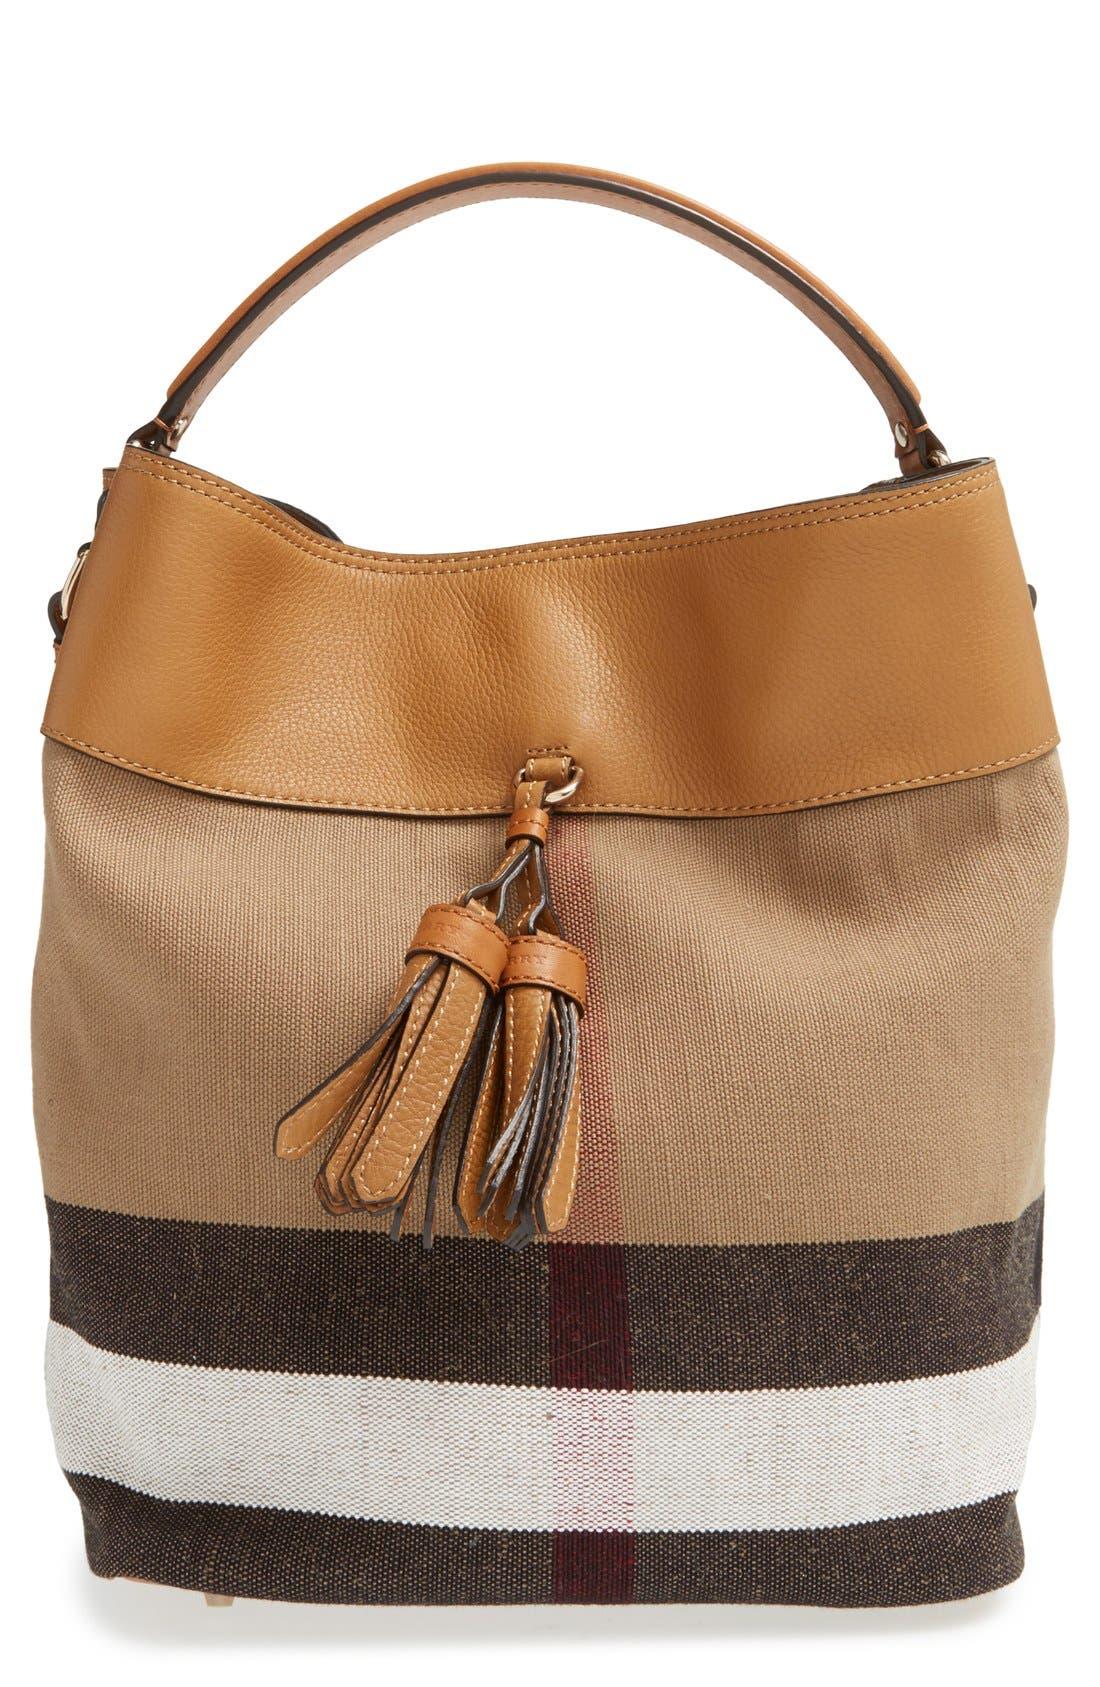 BURBERRY,                             Medium Ashby Bucket Bag,                             Main thumbnail 1, color,                             200